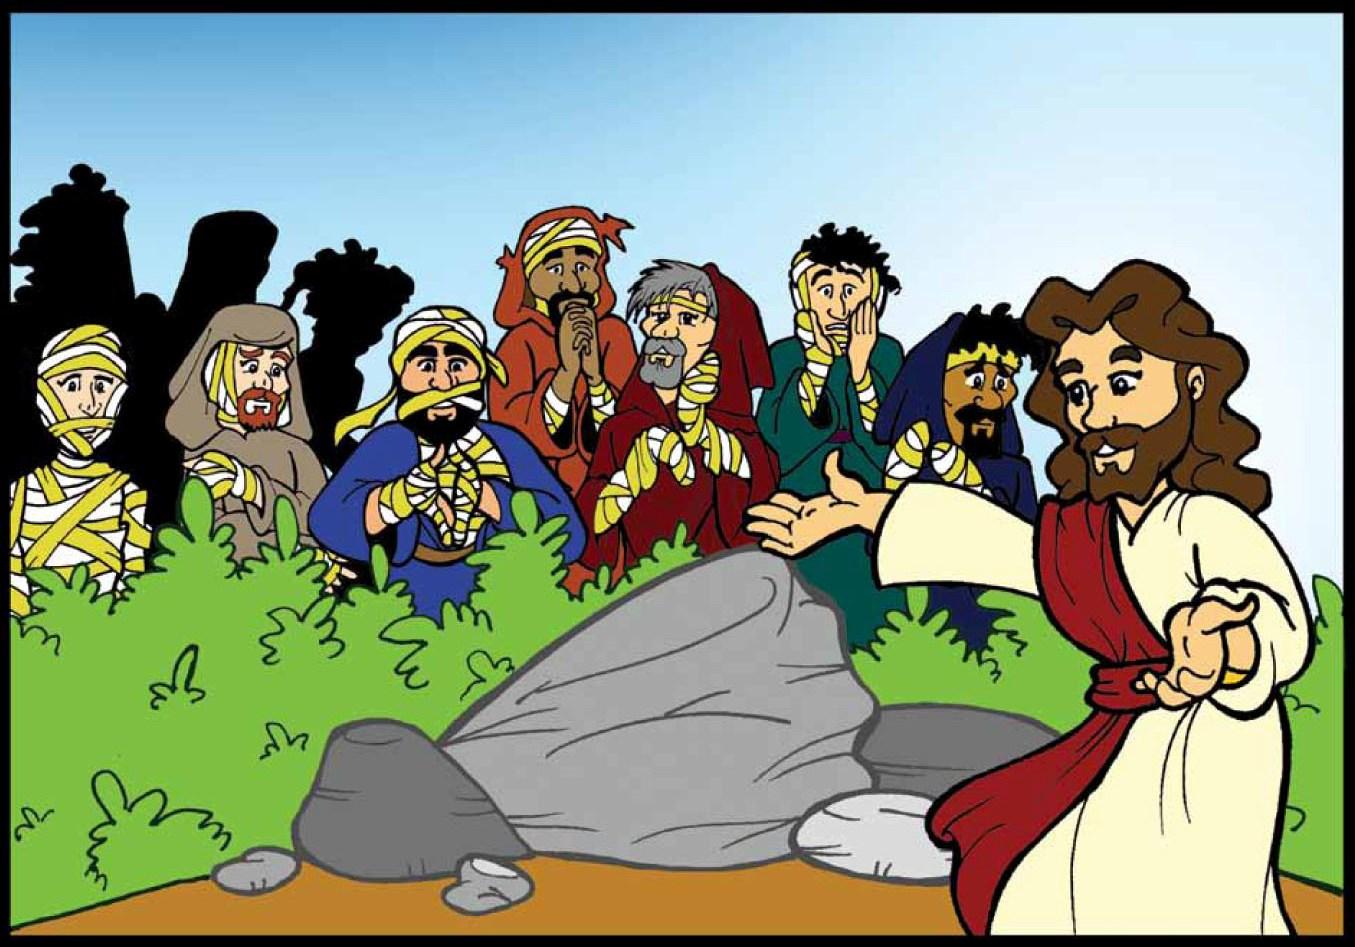 Tia Paula: Jesus cura dez leprosos